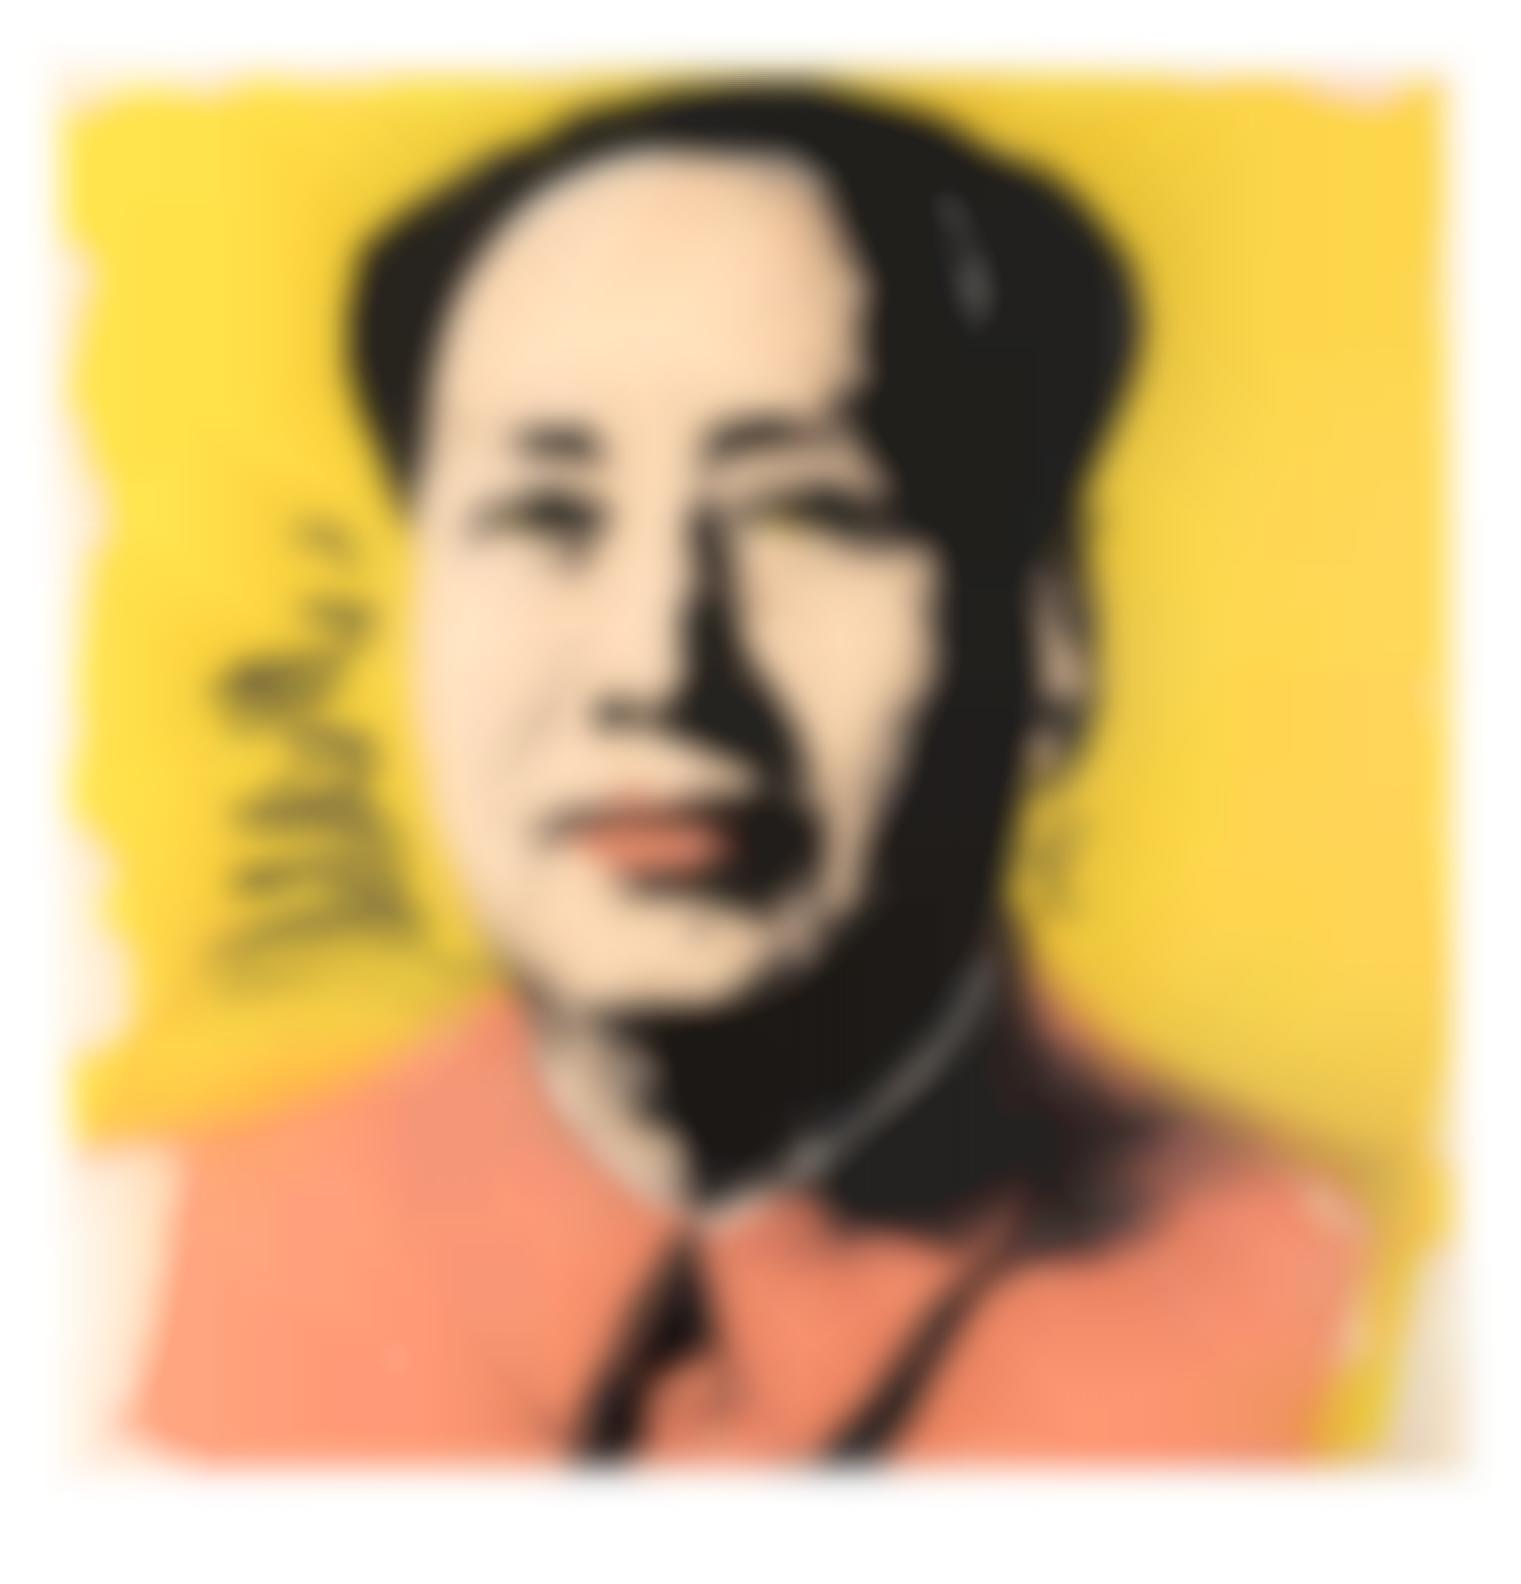 Andy Warhol-Mao (Feldman & Schellmann II.97)-1972